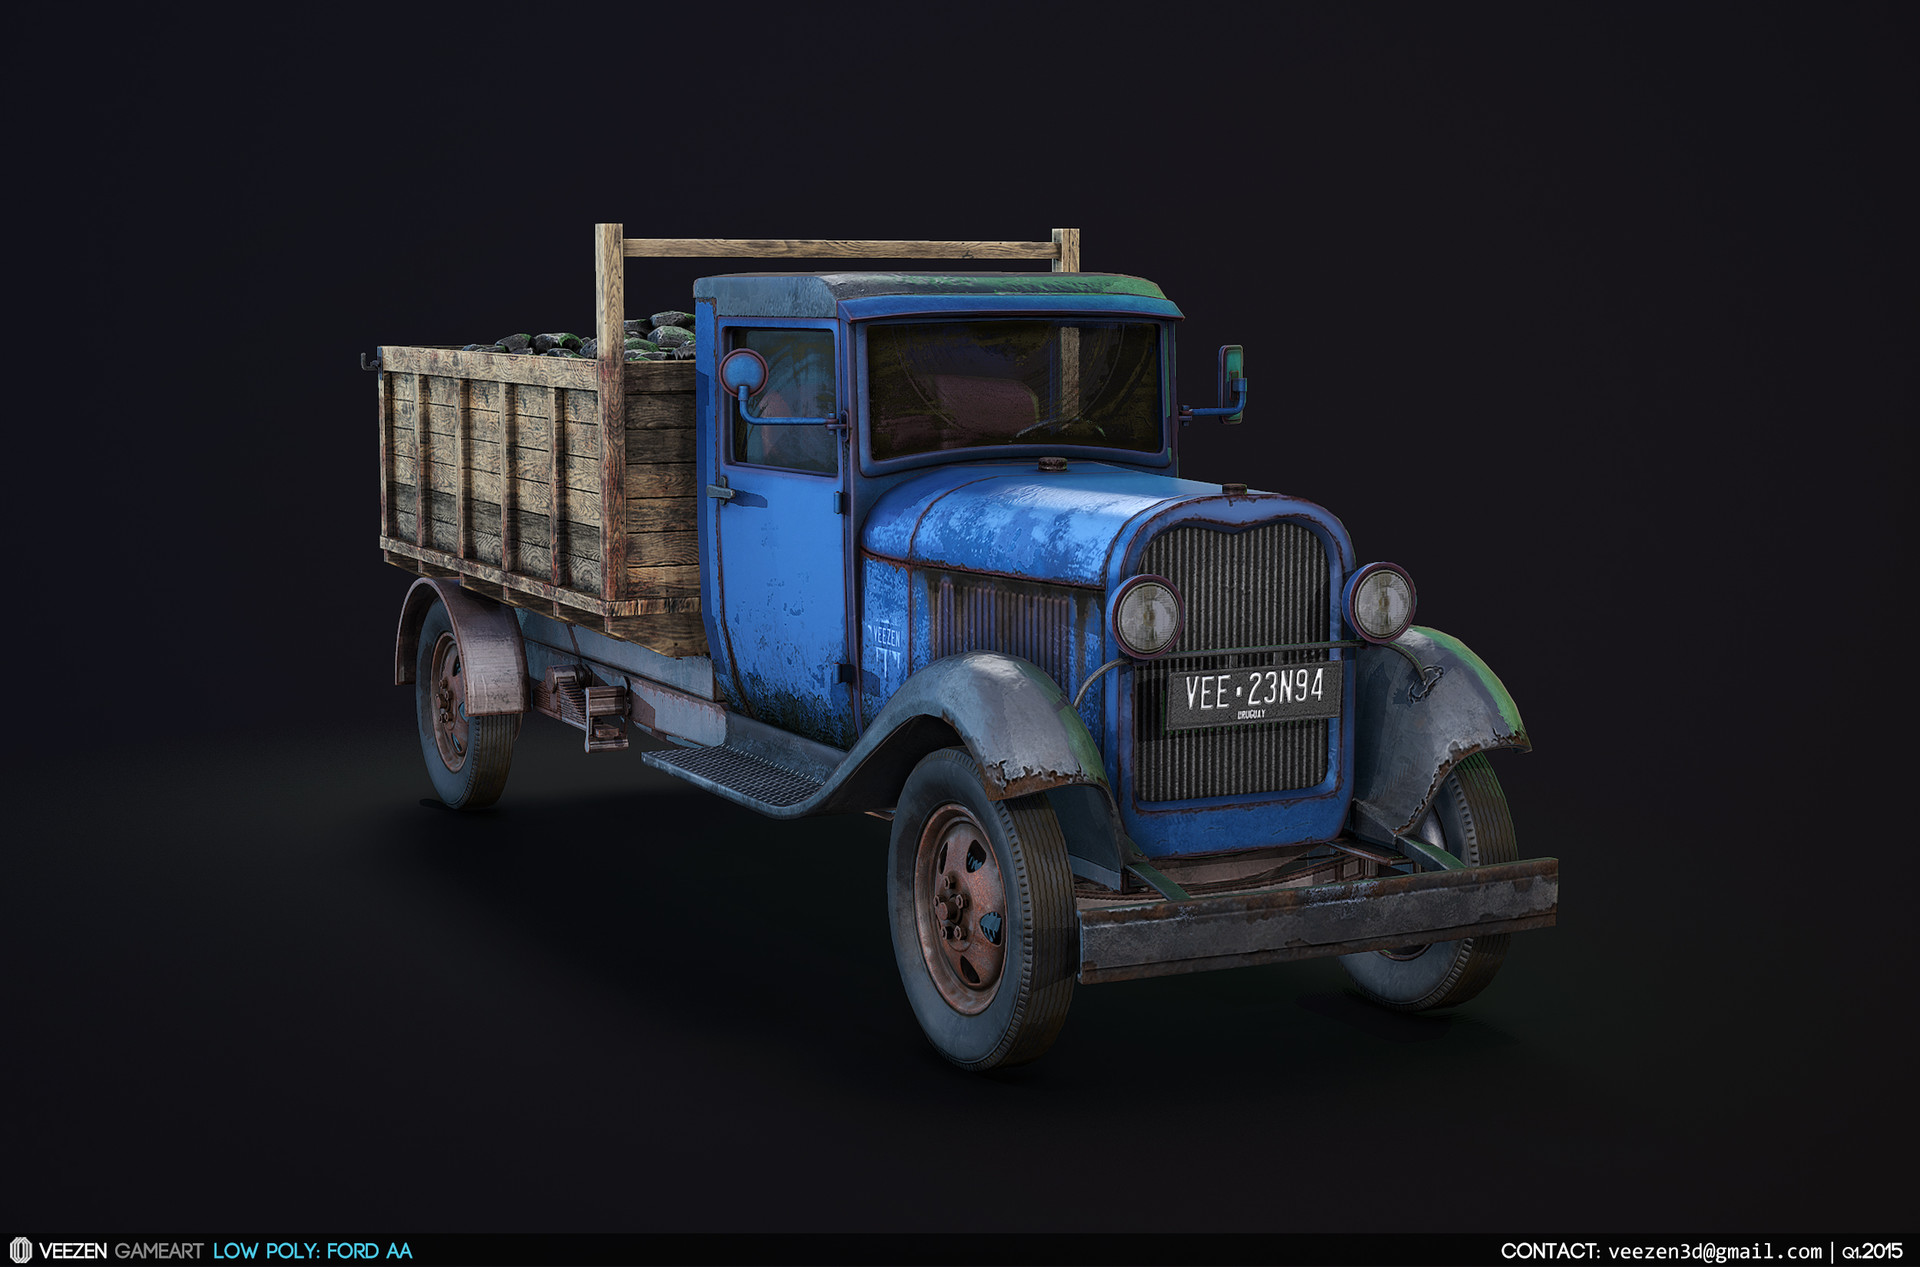 Michal veezen kalisz lp oldcar n 05